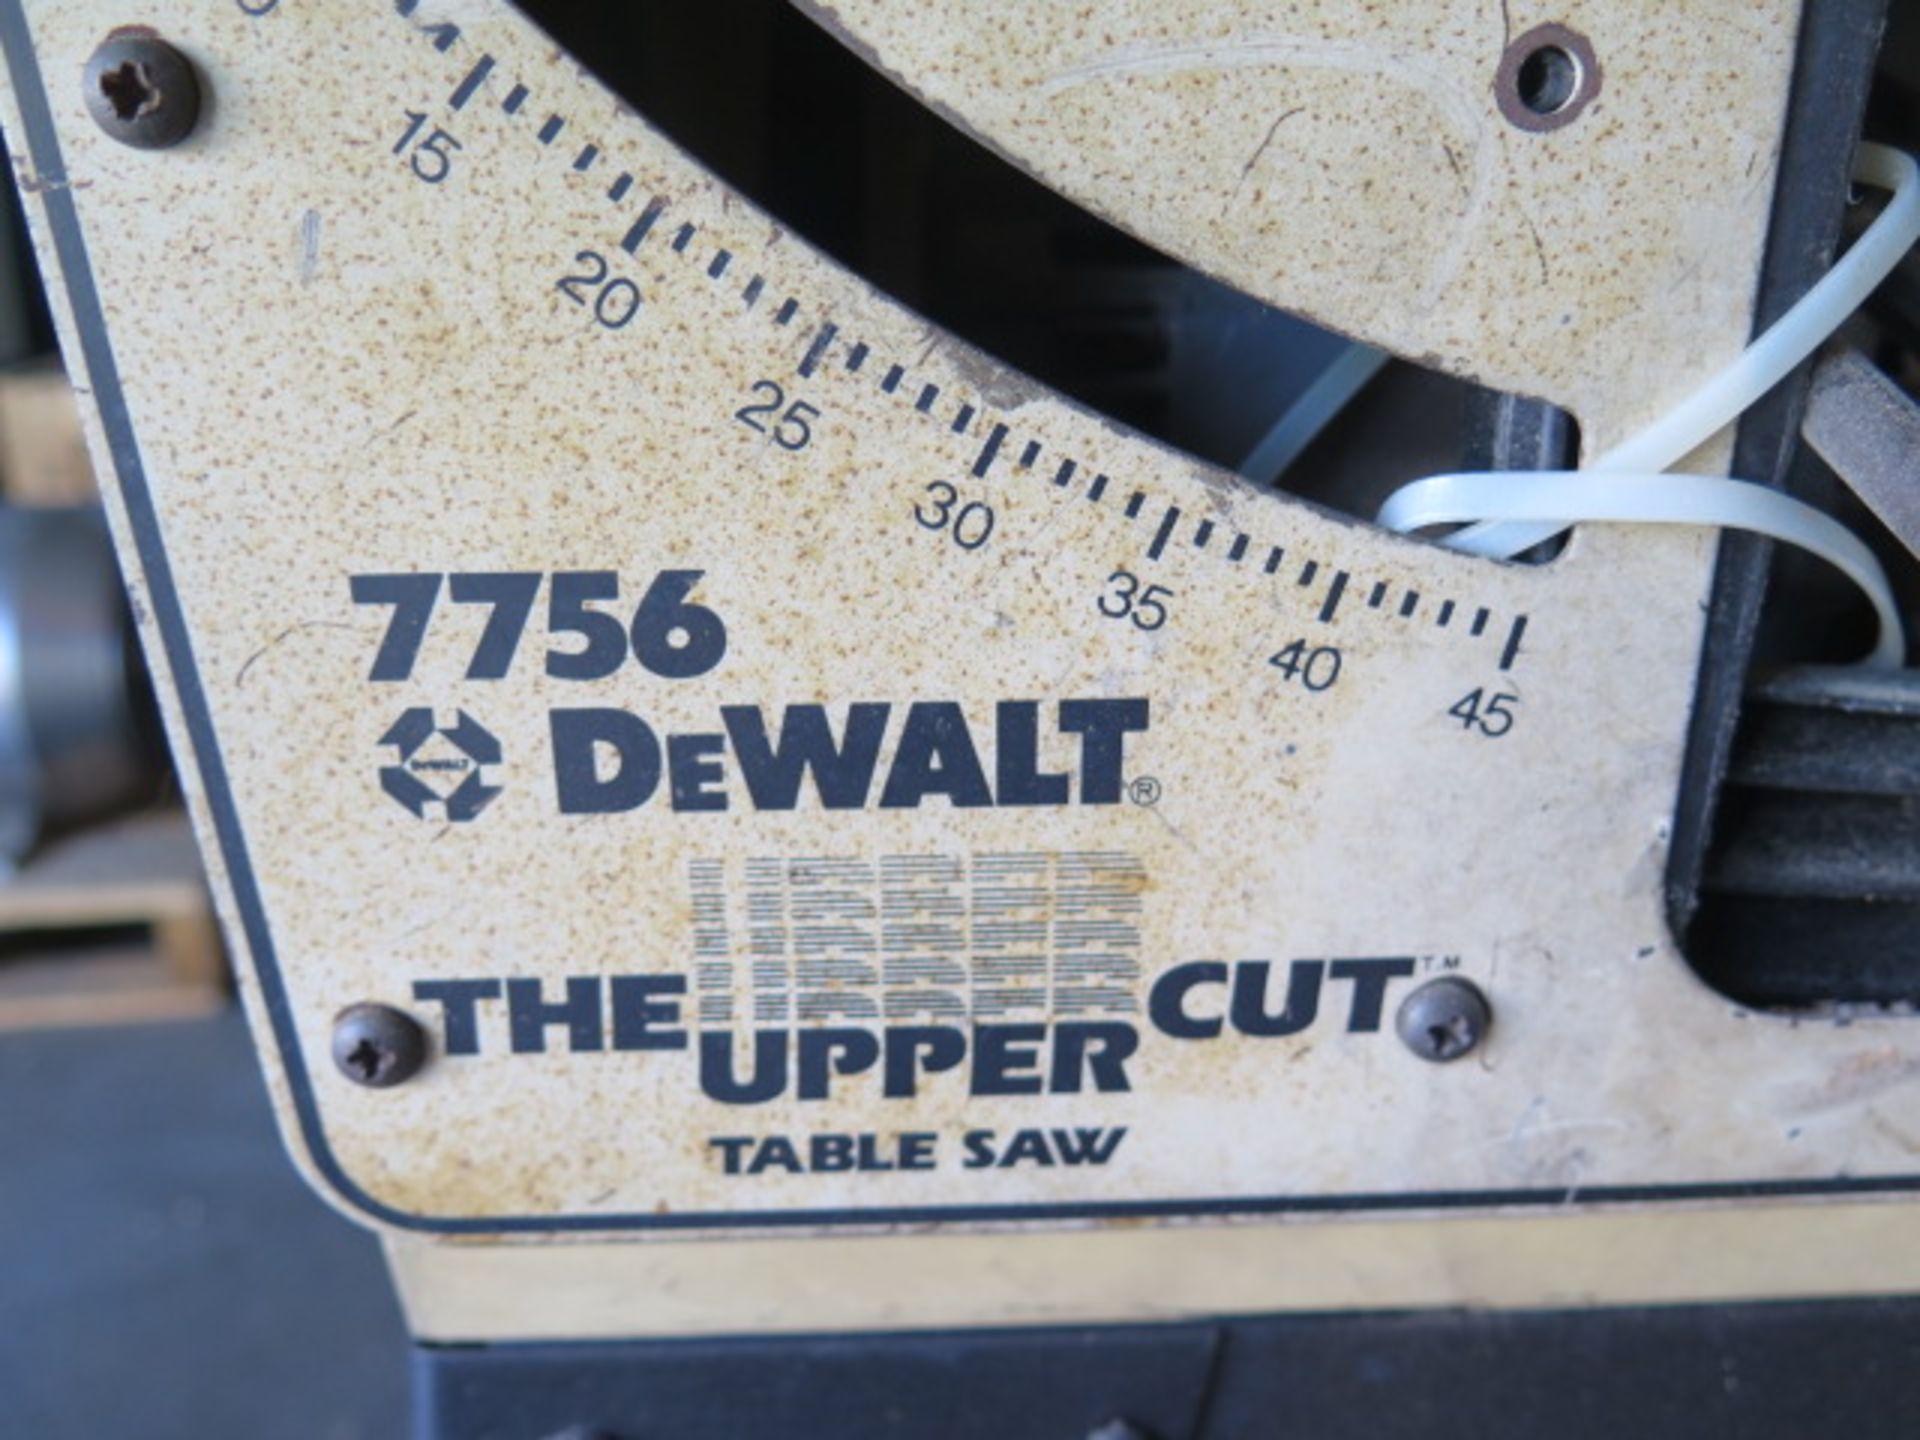 Lot 150 - DeWalt mdl. 7756 Tilting Arbor Table Saw w/ Fence System (SOLD AS-IS - NO WARRANTY)